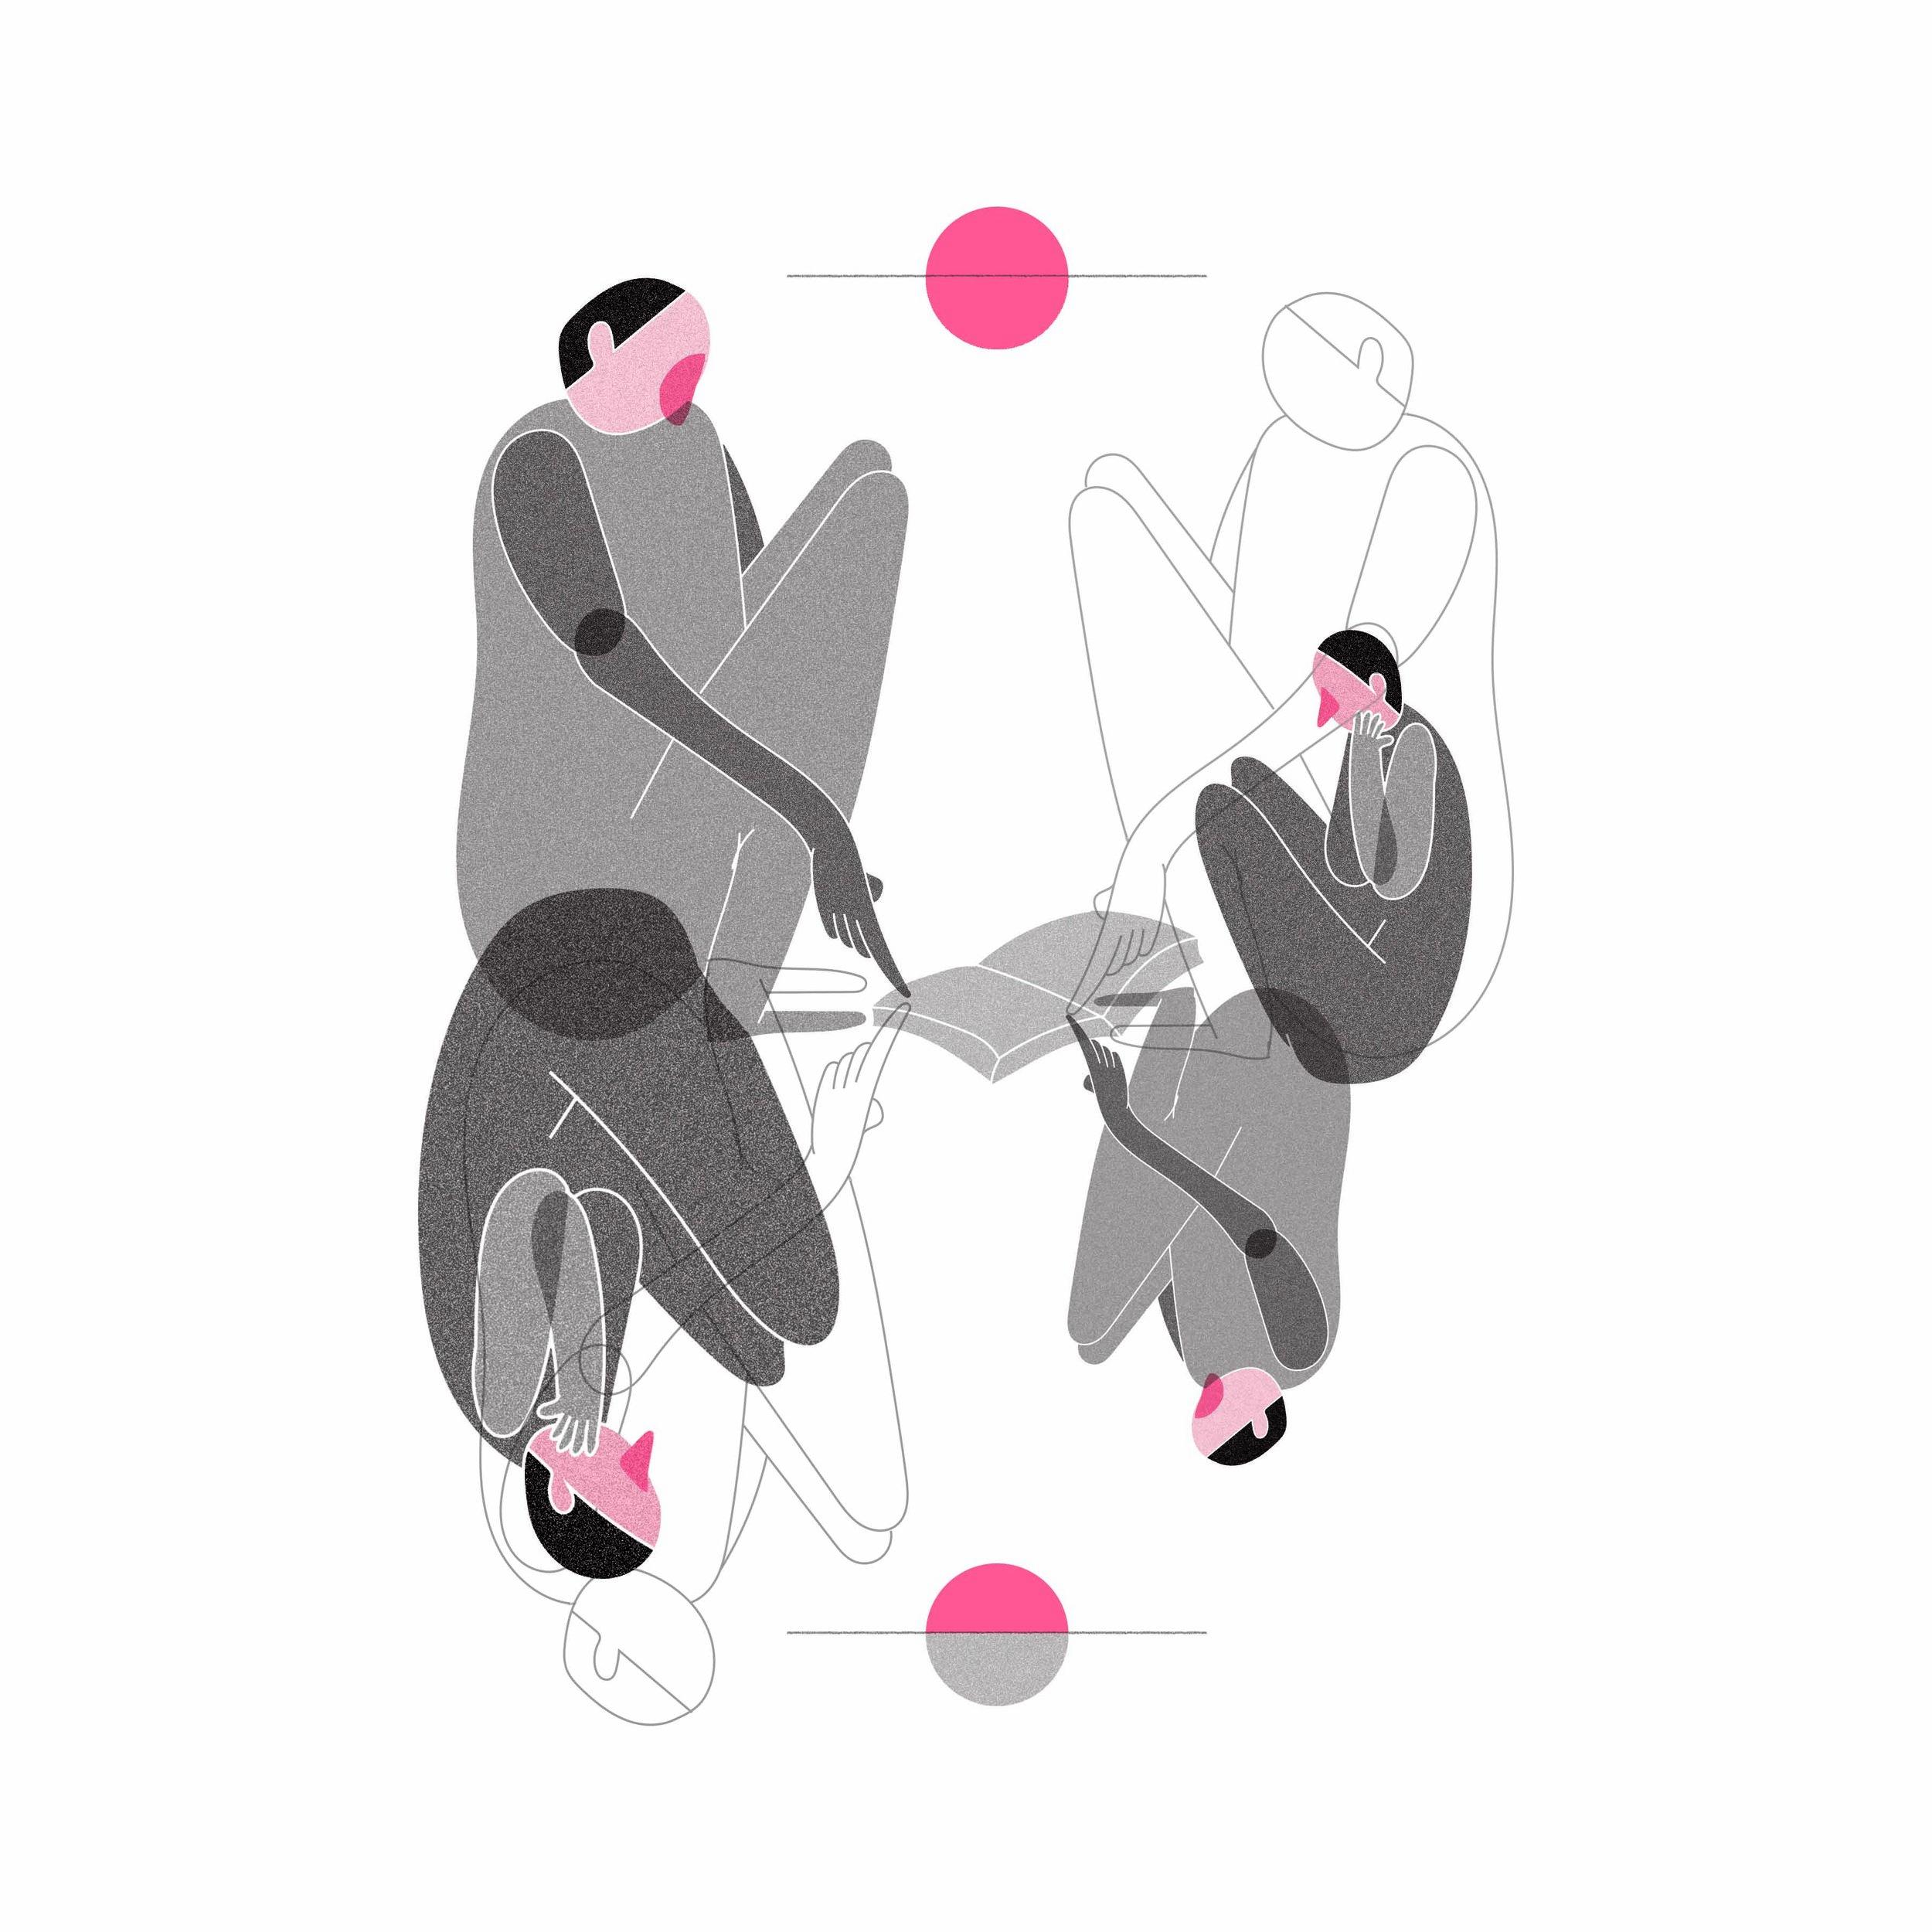 Illustration by Harshita Borah